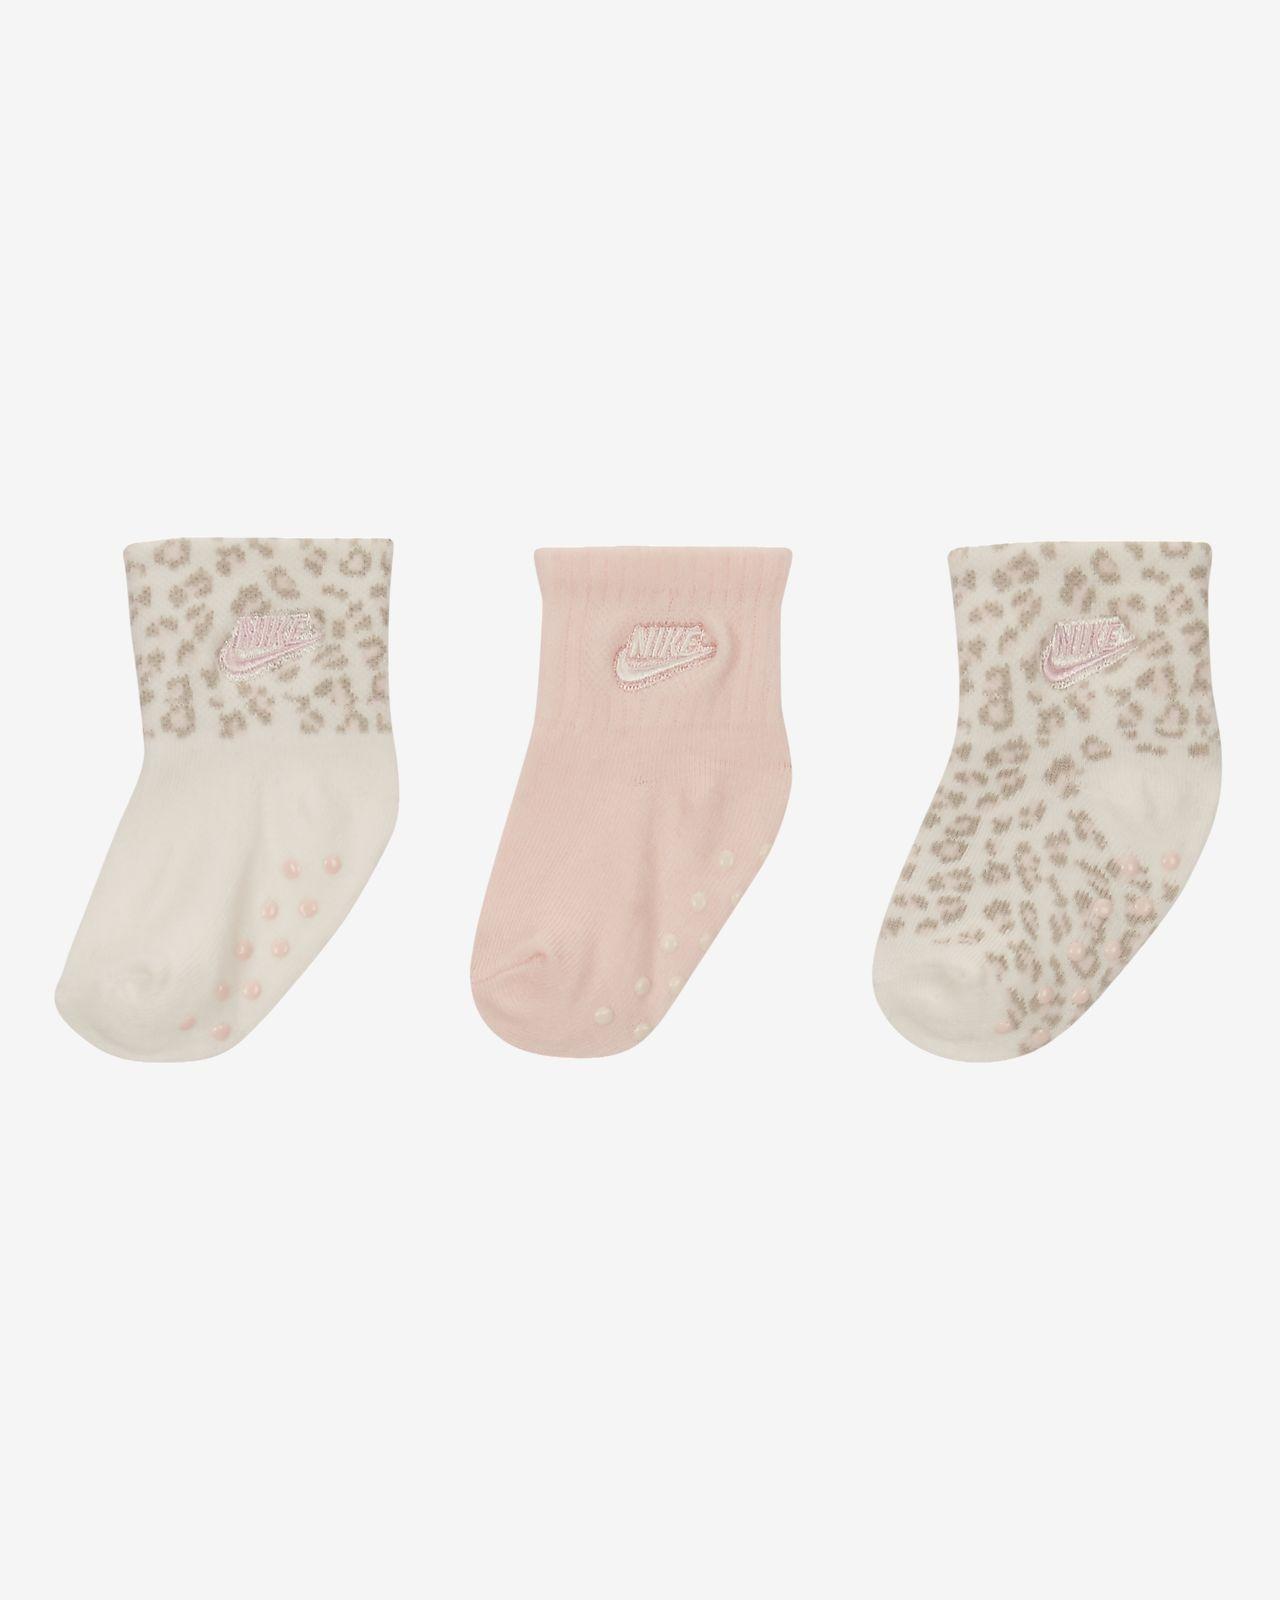 Nike Toddler Gripper Ankle Socks (3 Pairs)